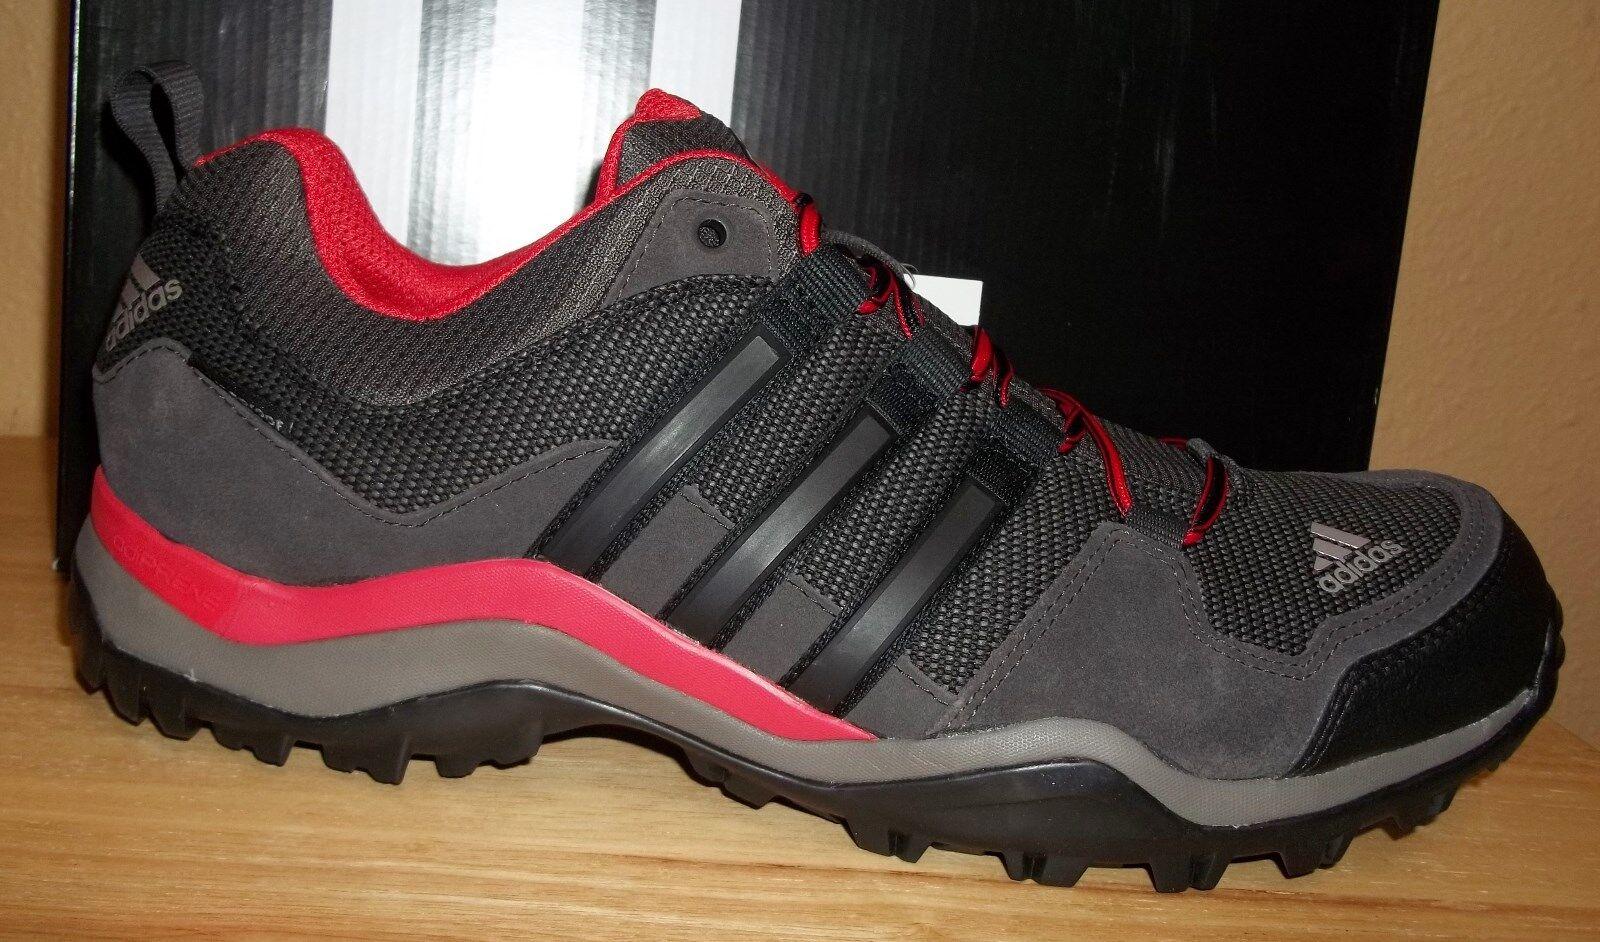 NIB Adidas Outdoor KUMACROSS MESH CP Climaproof Men's shoes NIB US 11.5